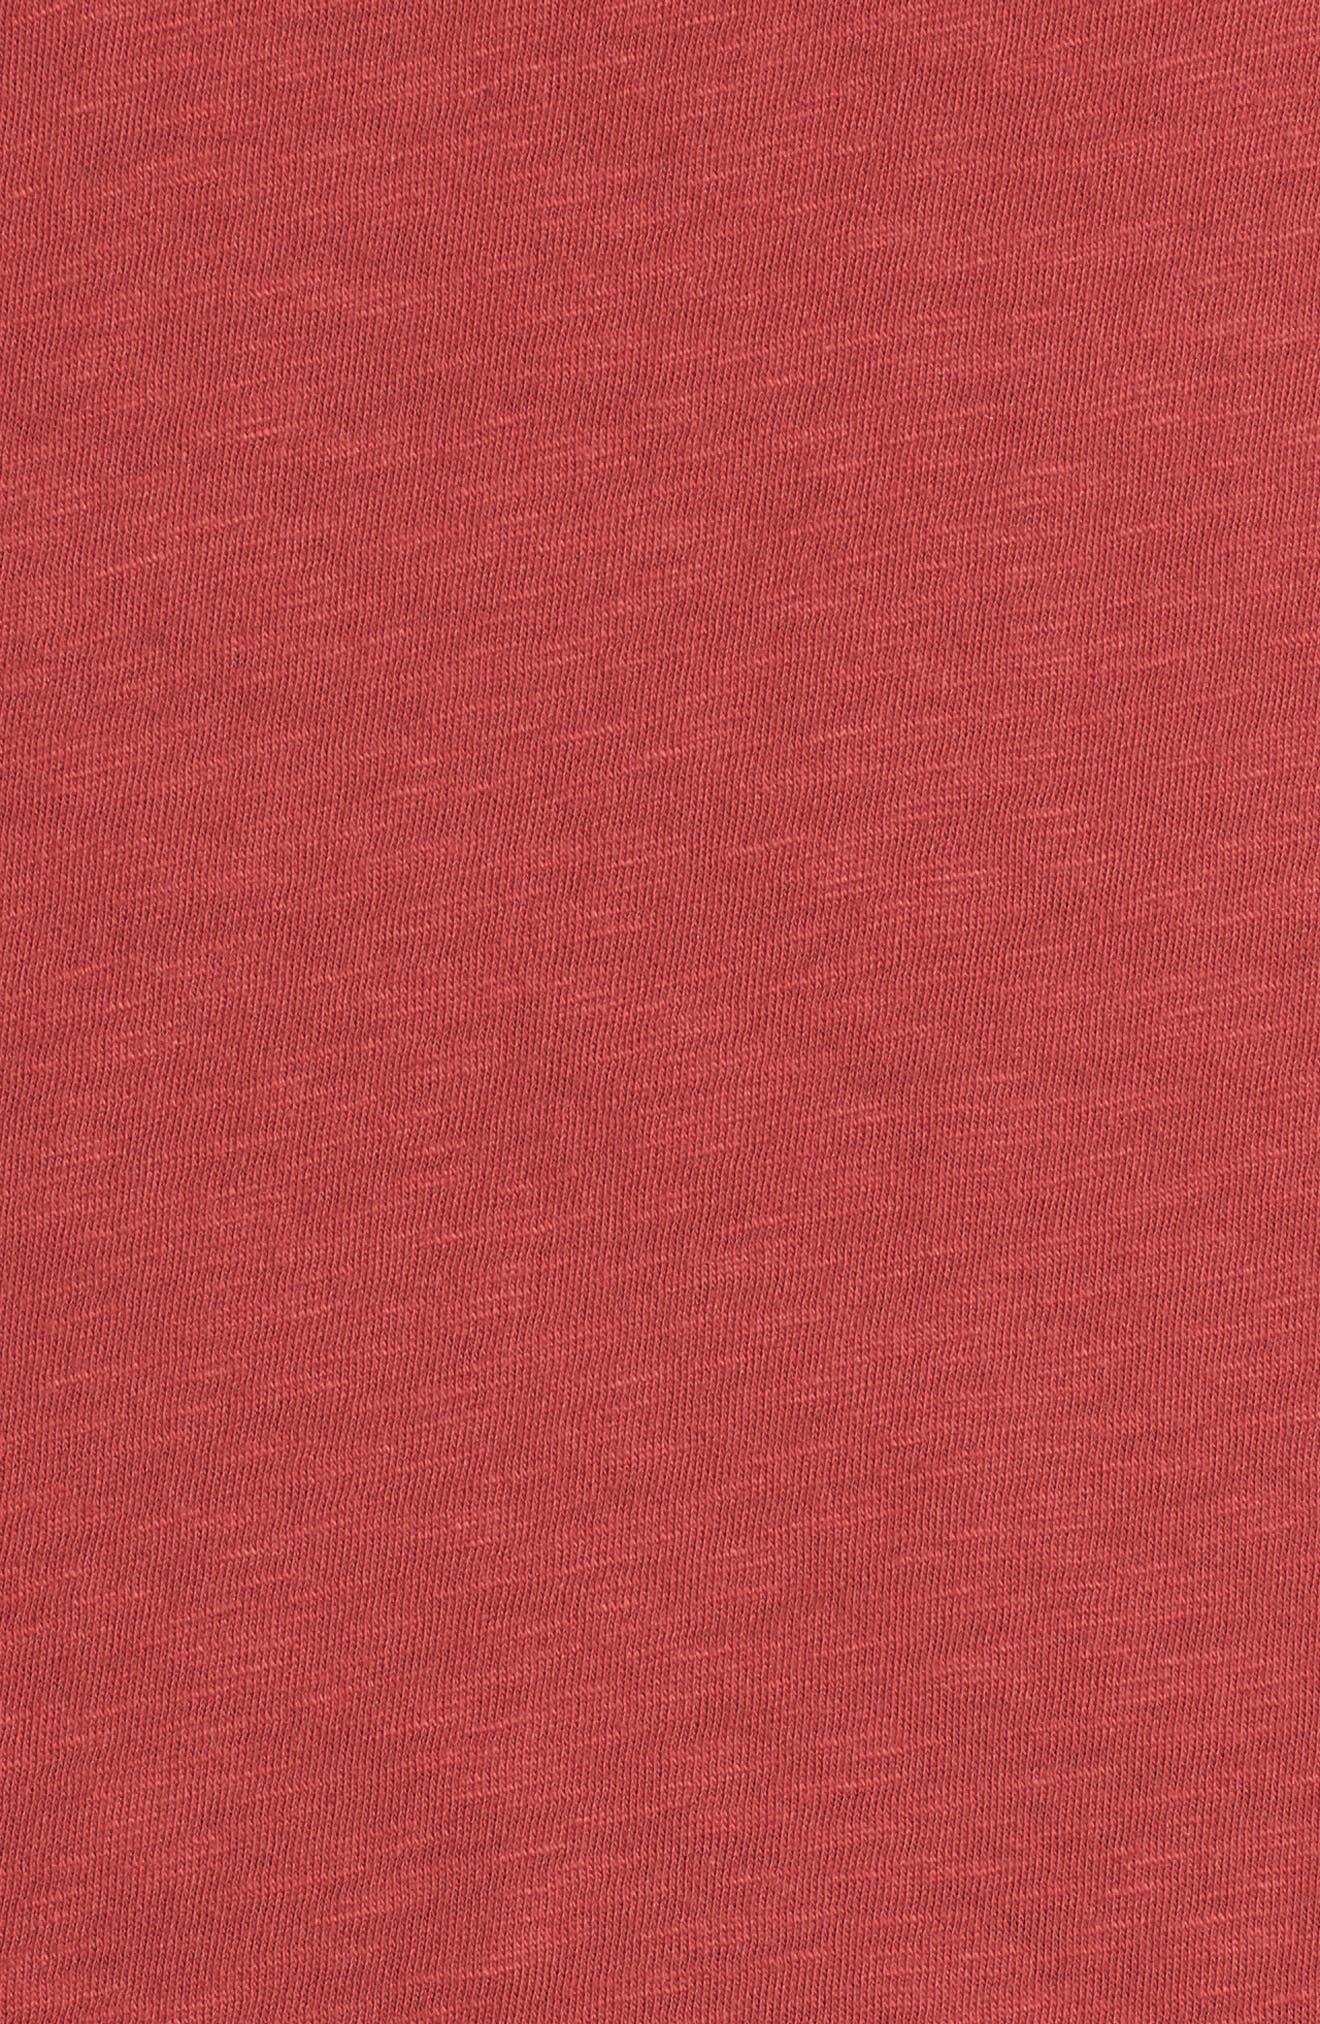 Pleat Sleeve Cotton Tee,                             Alternate thumbnail 25, color,